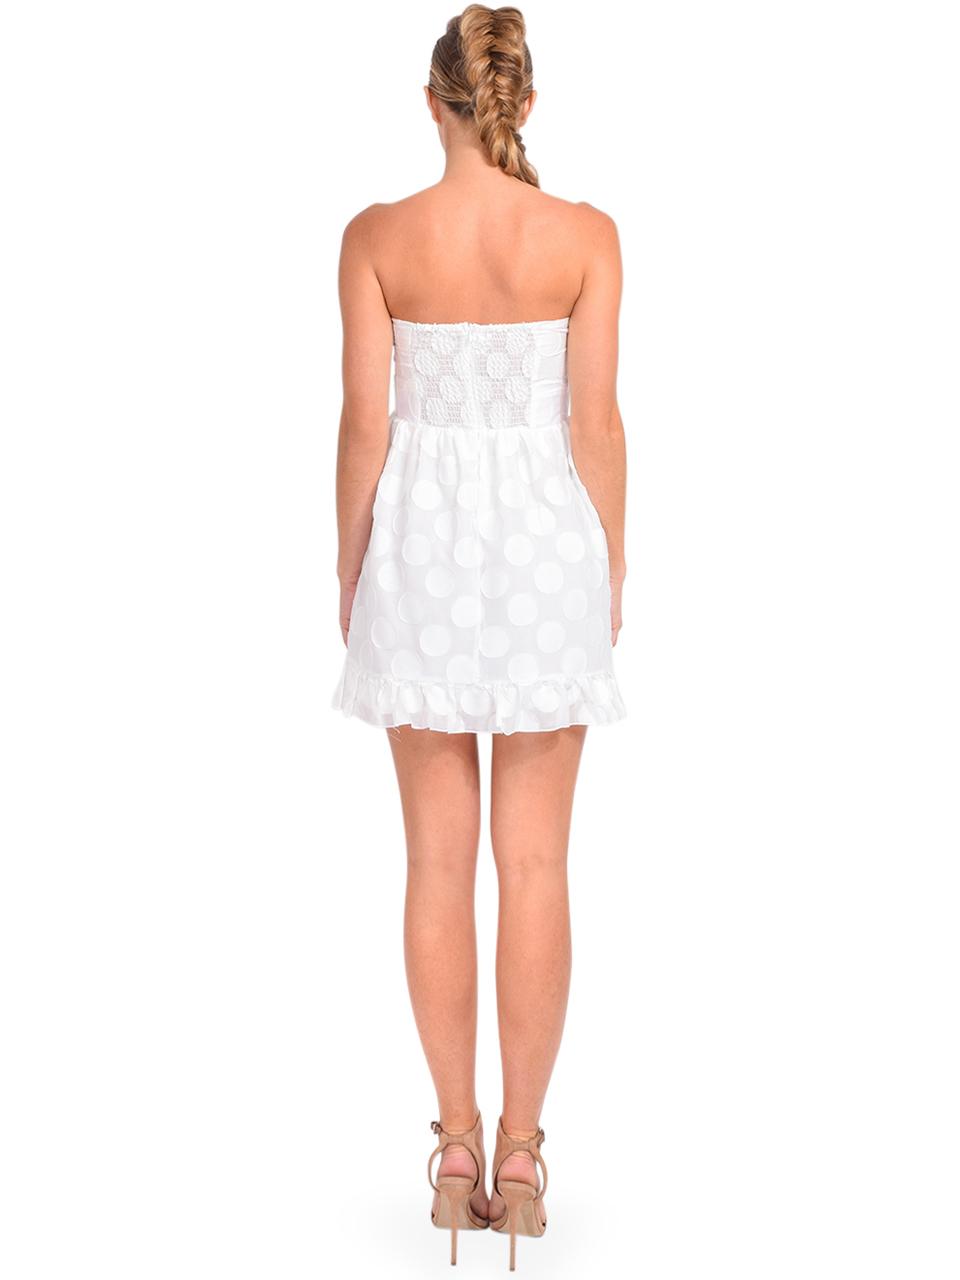 Karina Grimaldi Annie Dot Mini Dress in White Back View